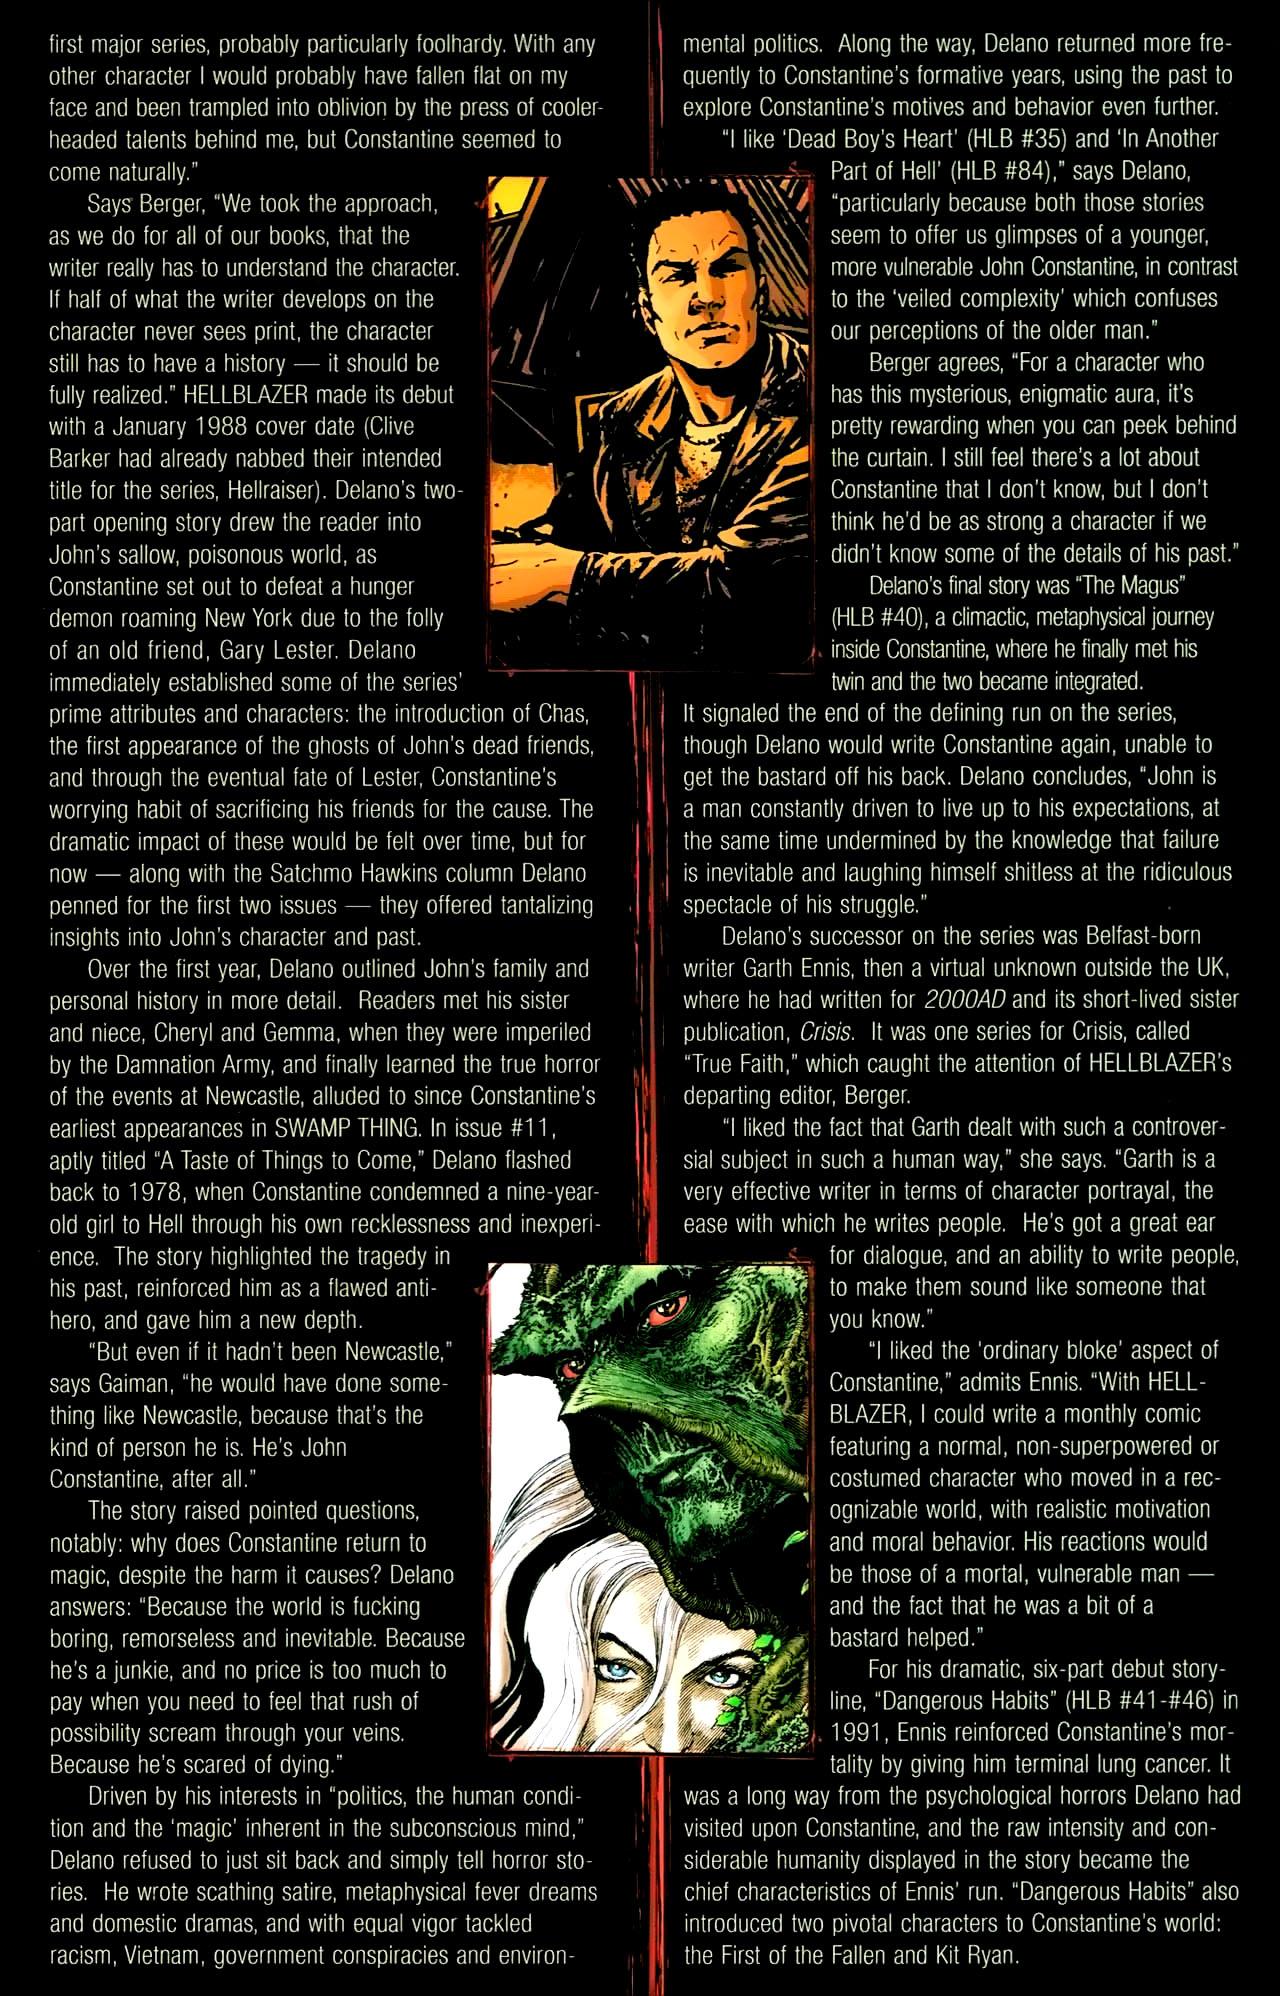 Read online John Constantine Hellblazer: All His Engines comic -  Issue # Full - 122